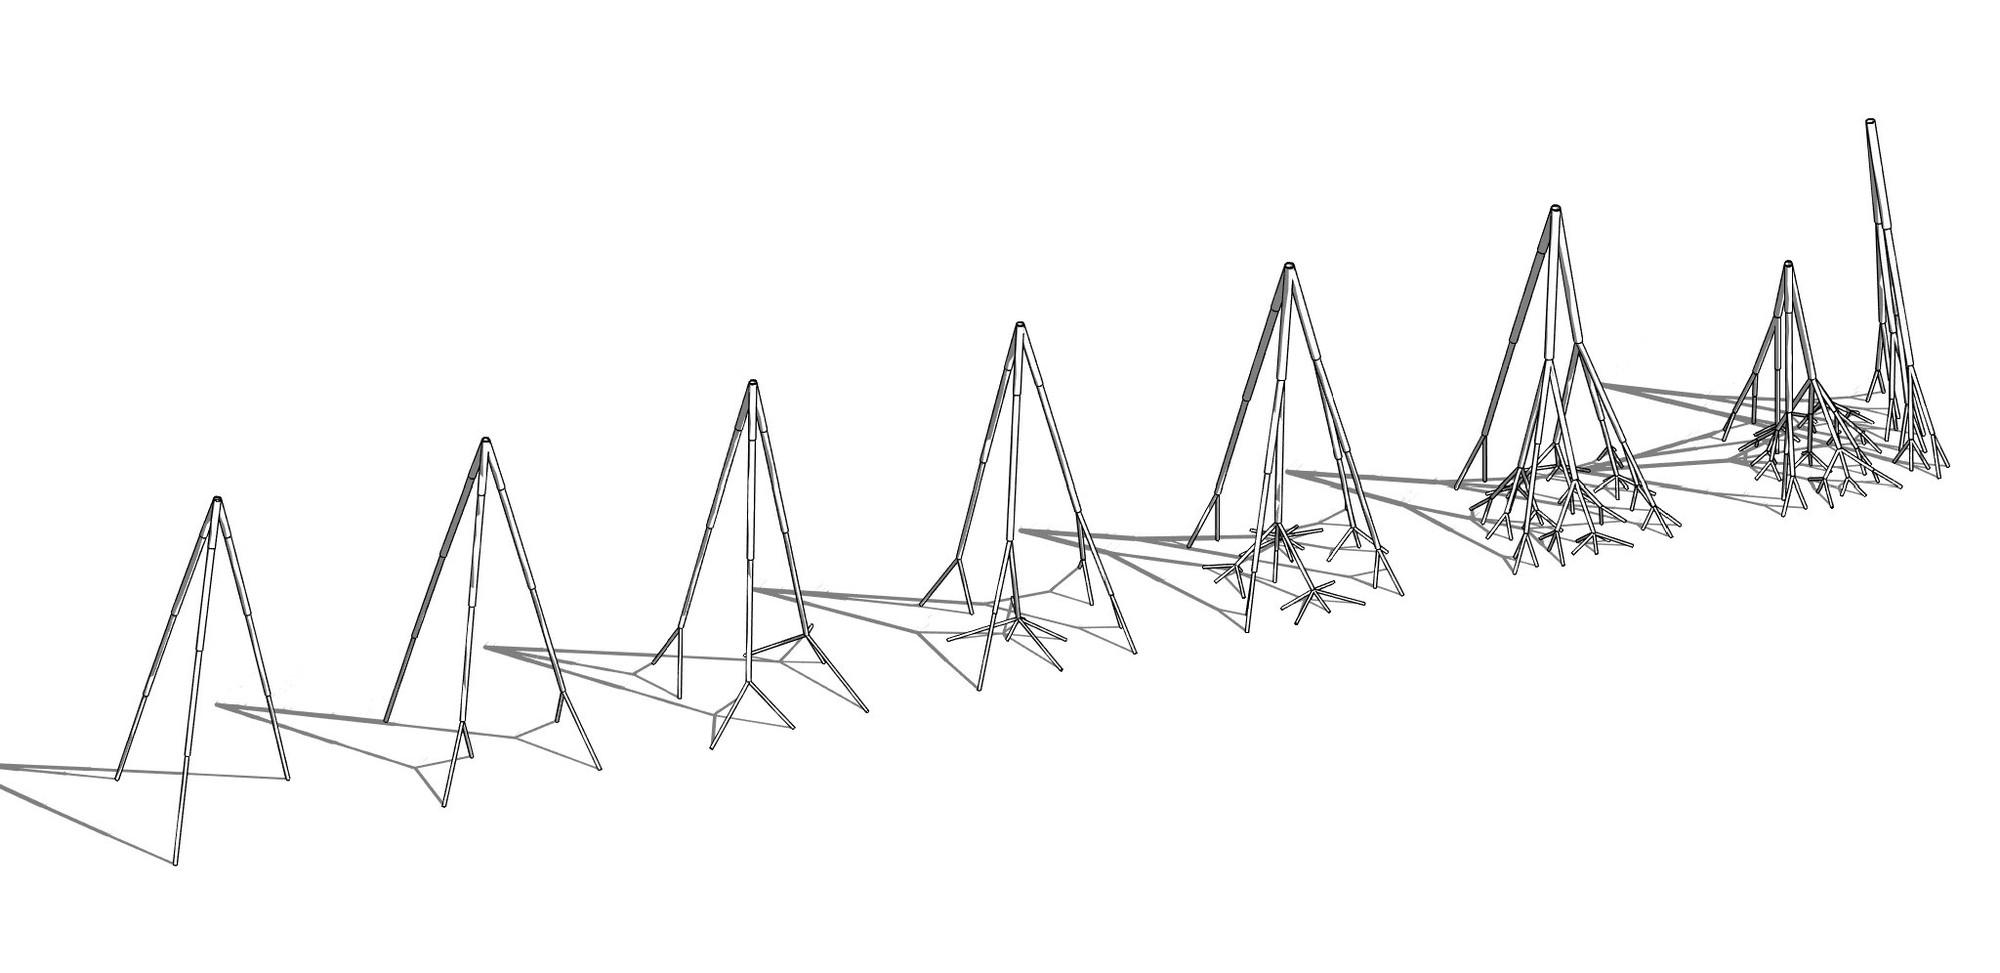 Estructura. Image Courtesy of Equipo Segundo Lugar